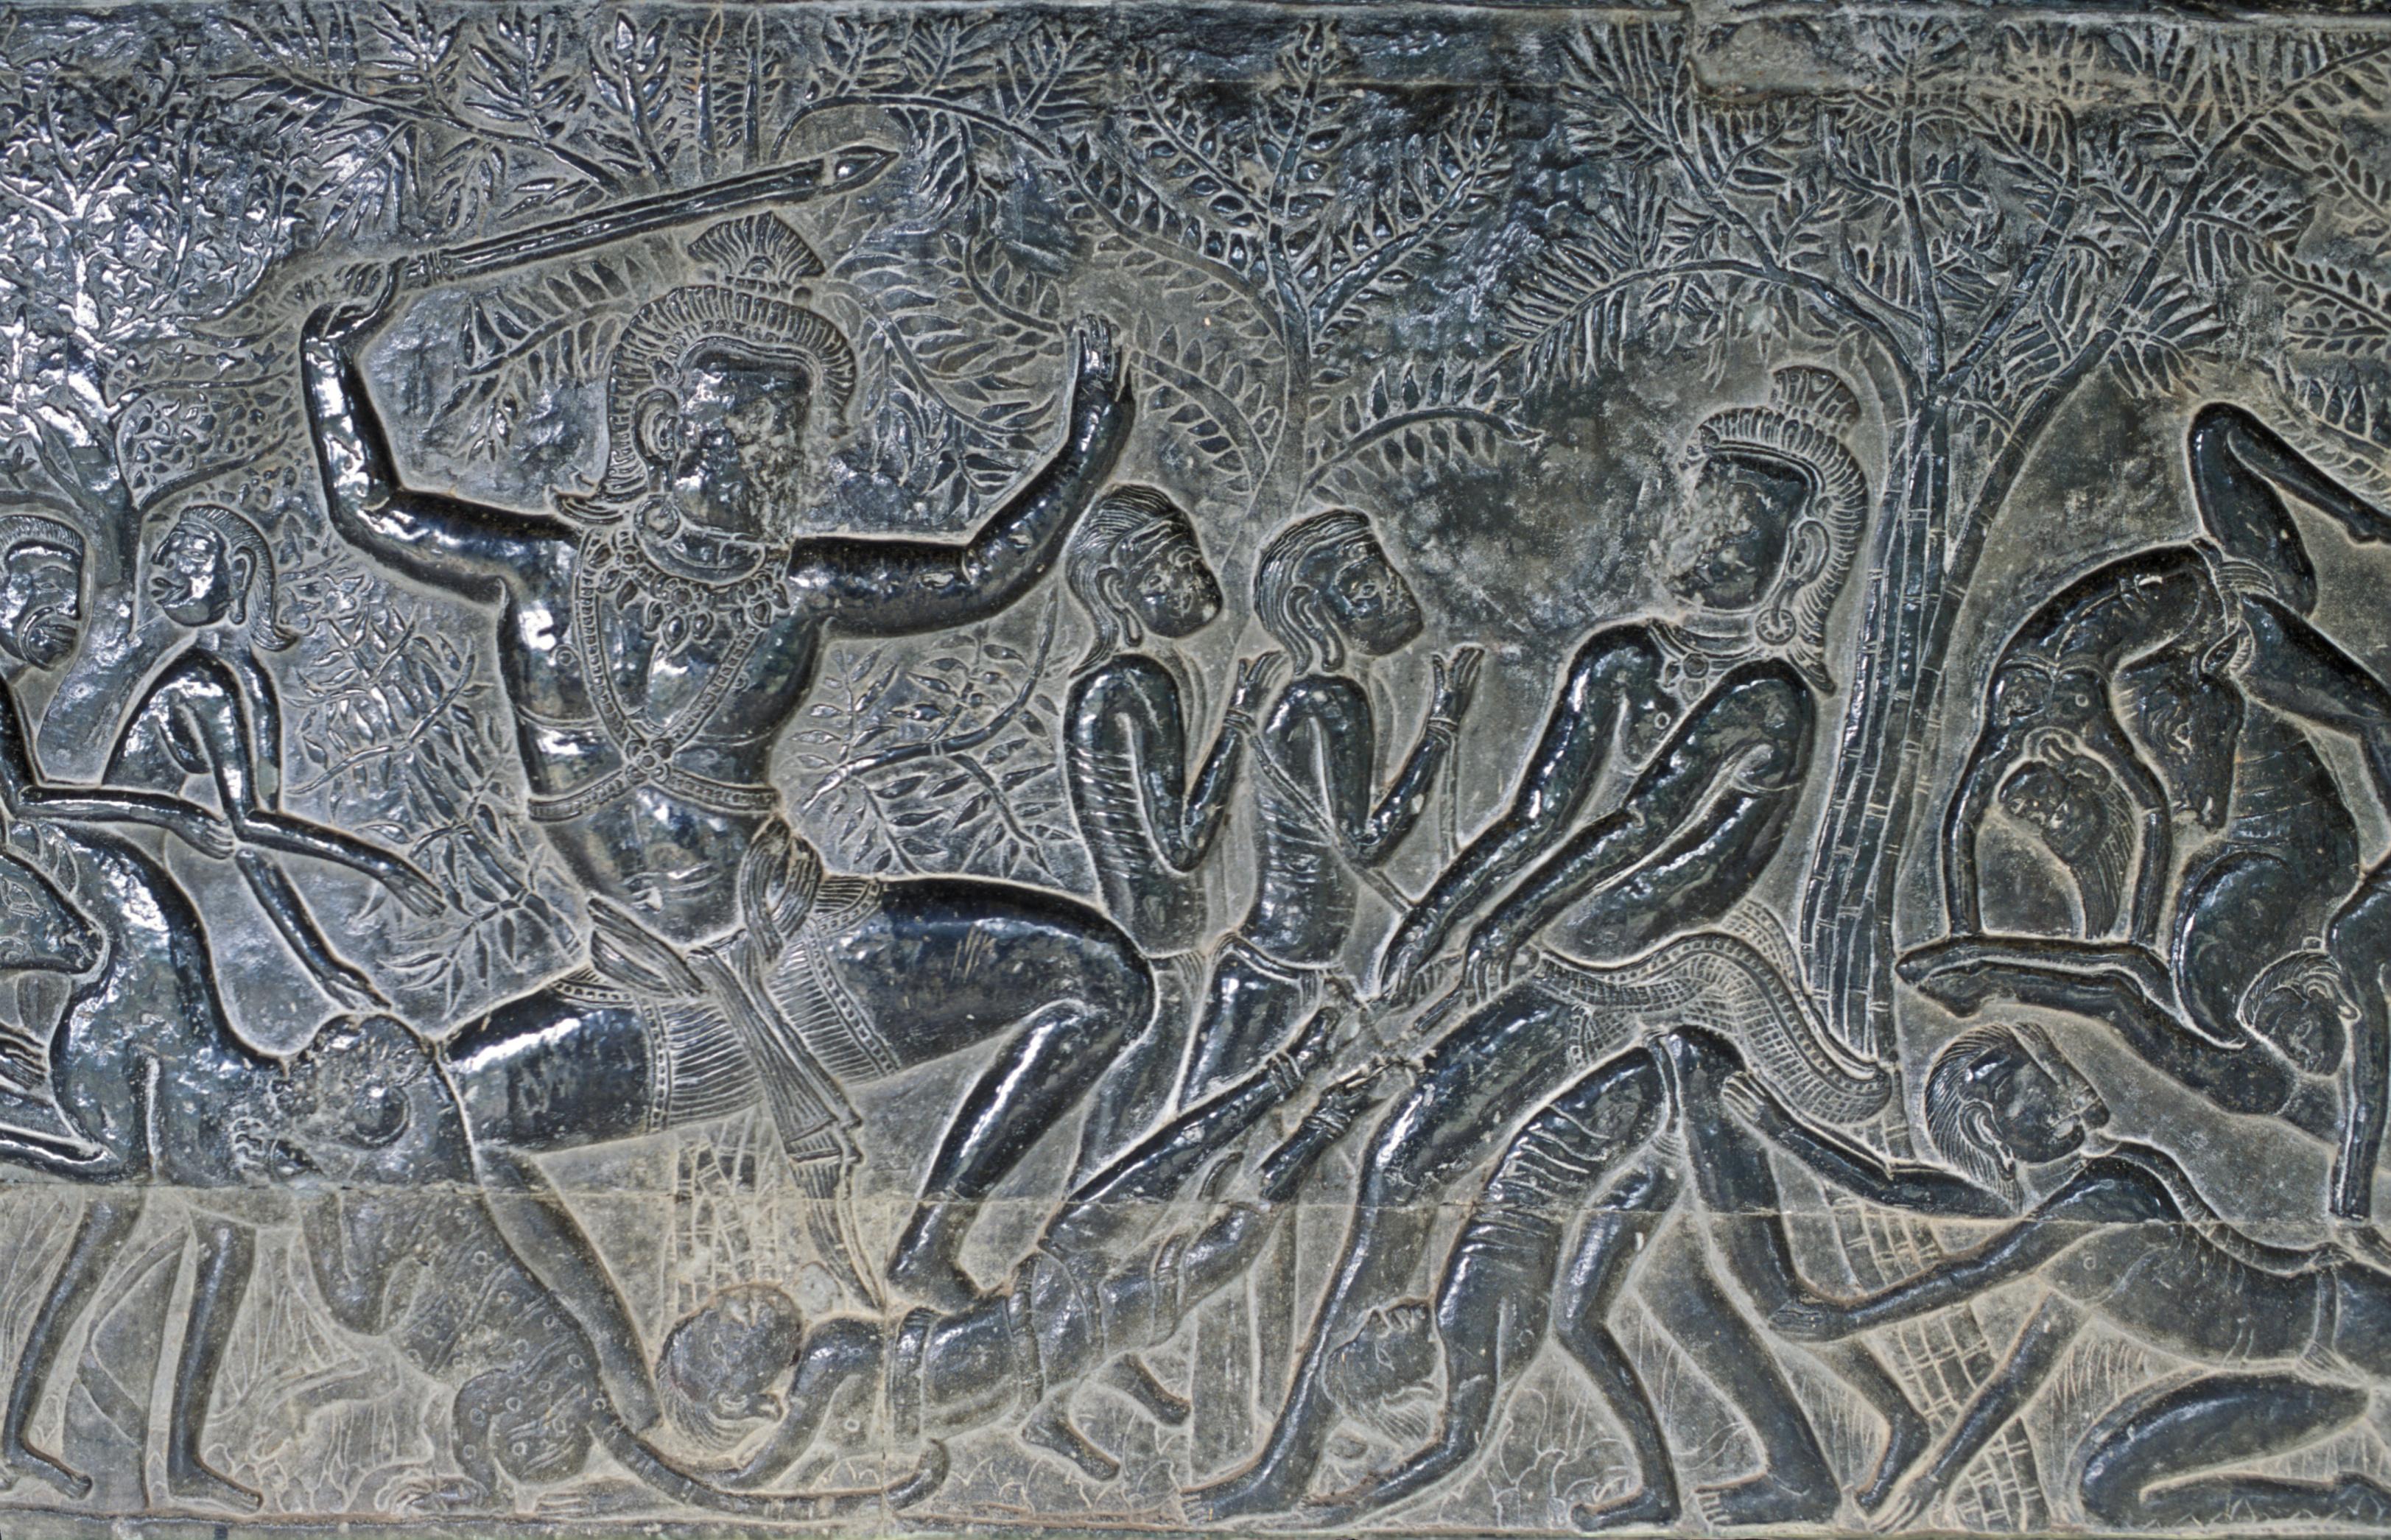 Siva dance – Angkor Wat